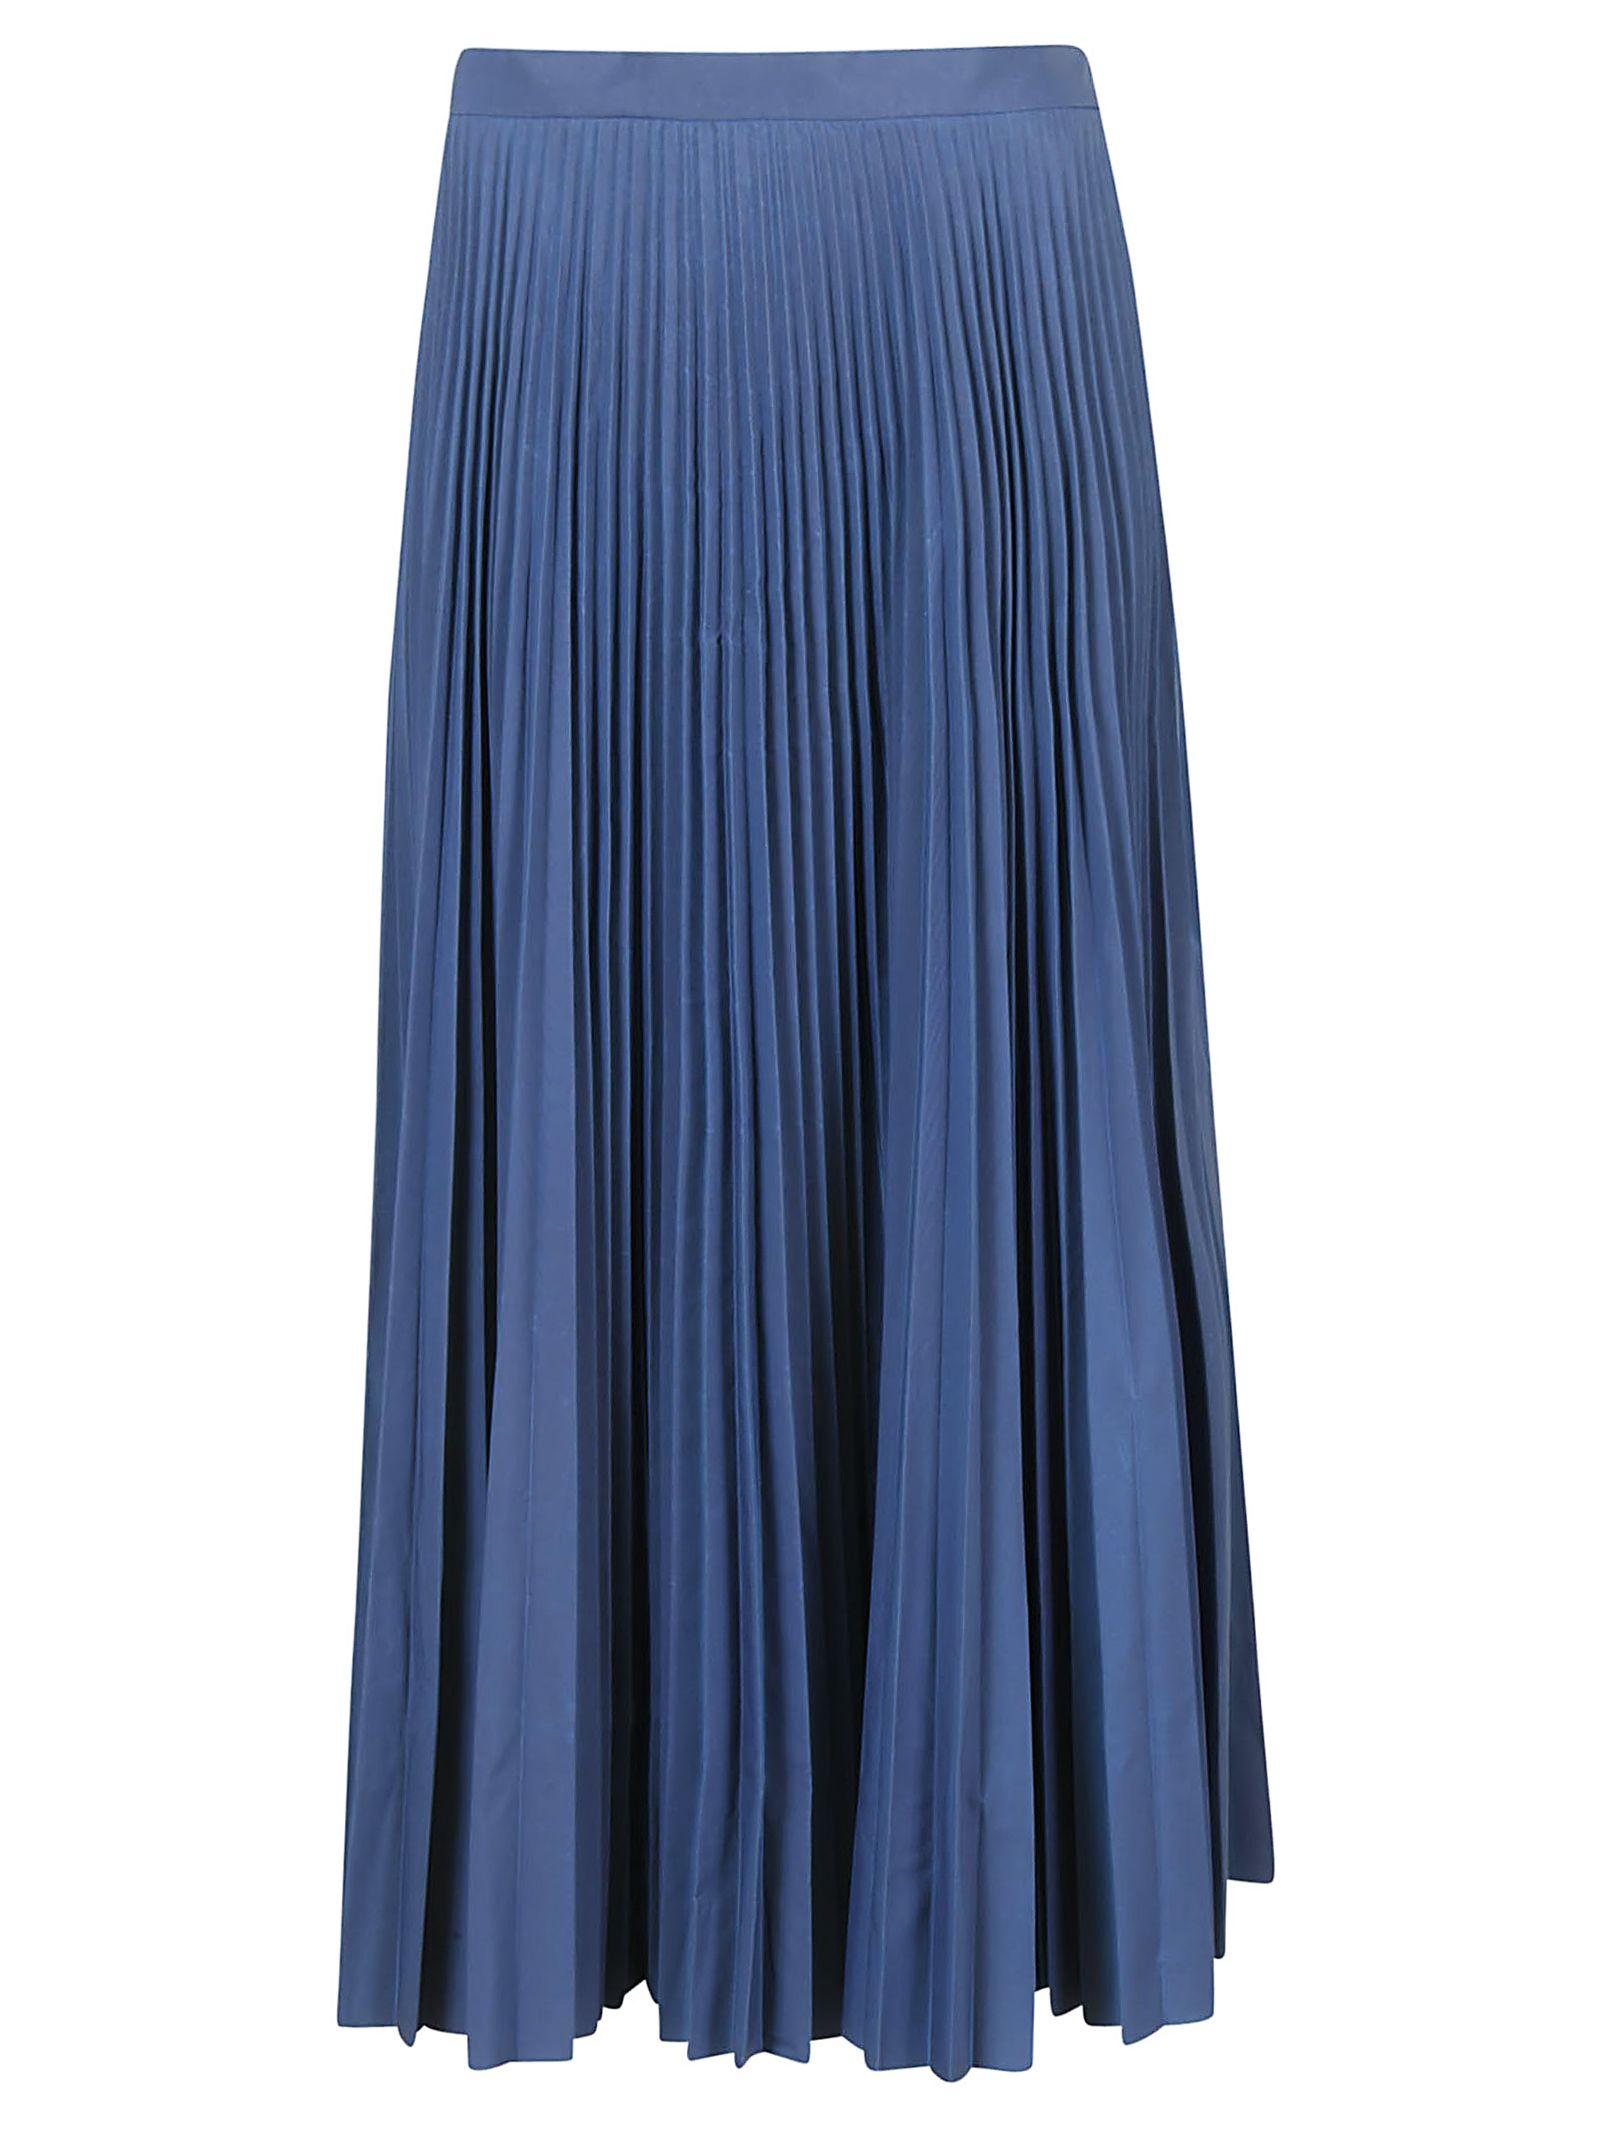 Midi Pleatde Skirt In Reflector Fabric, Blue